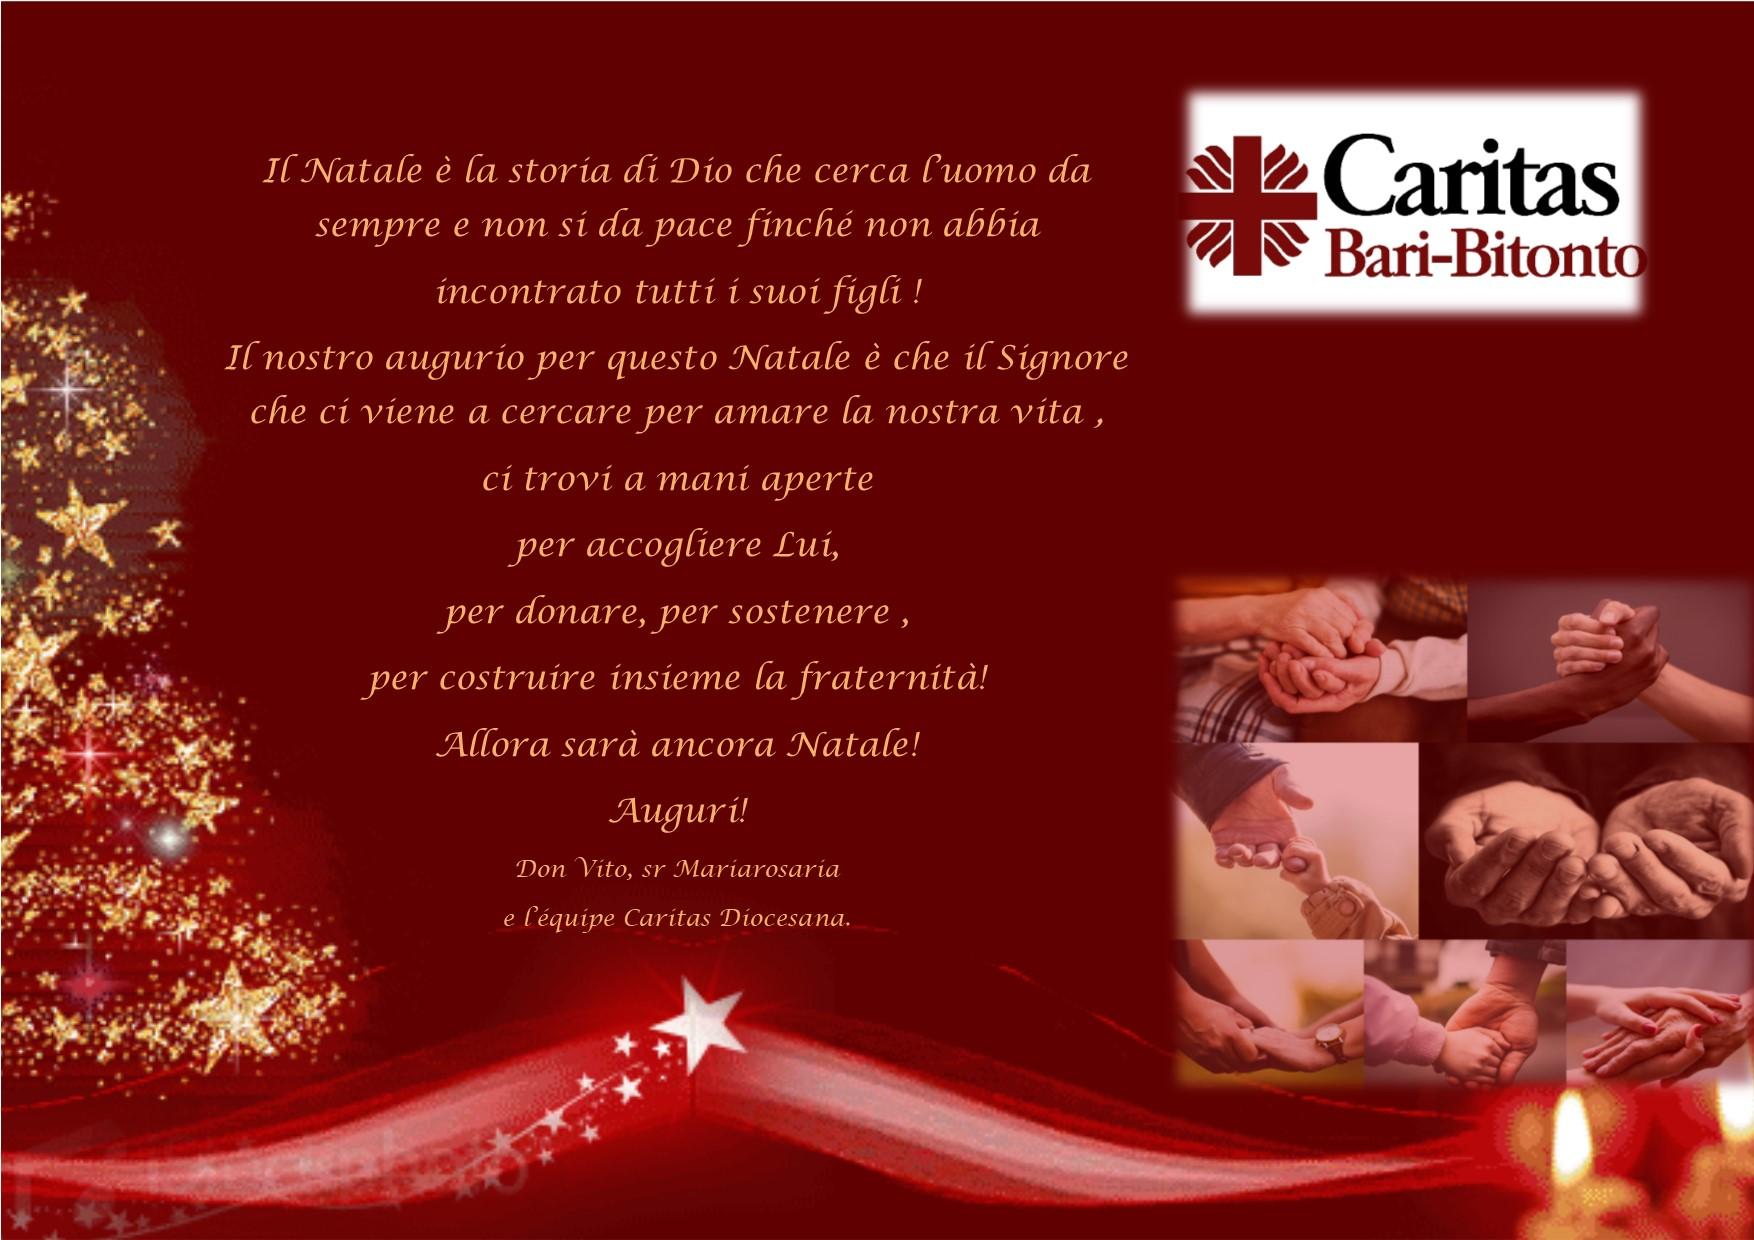 Auguri Di Natale Per I Figli.Auguri Di Natale Caritas Diocesana Bari Bitonto